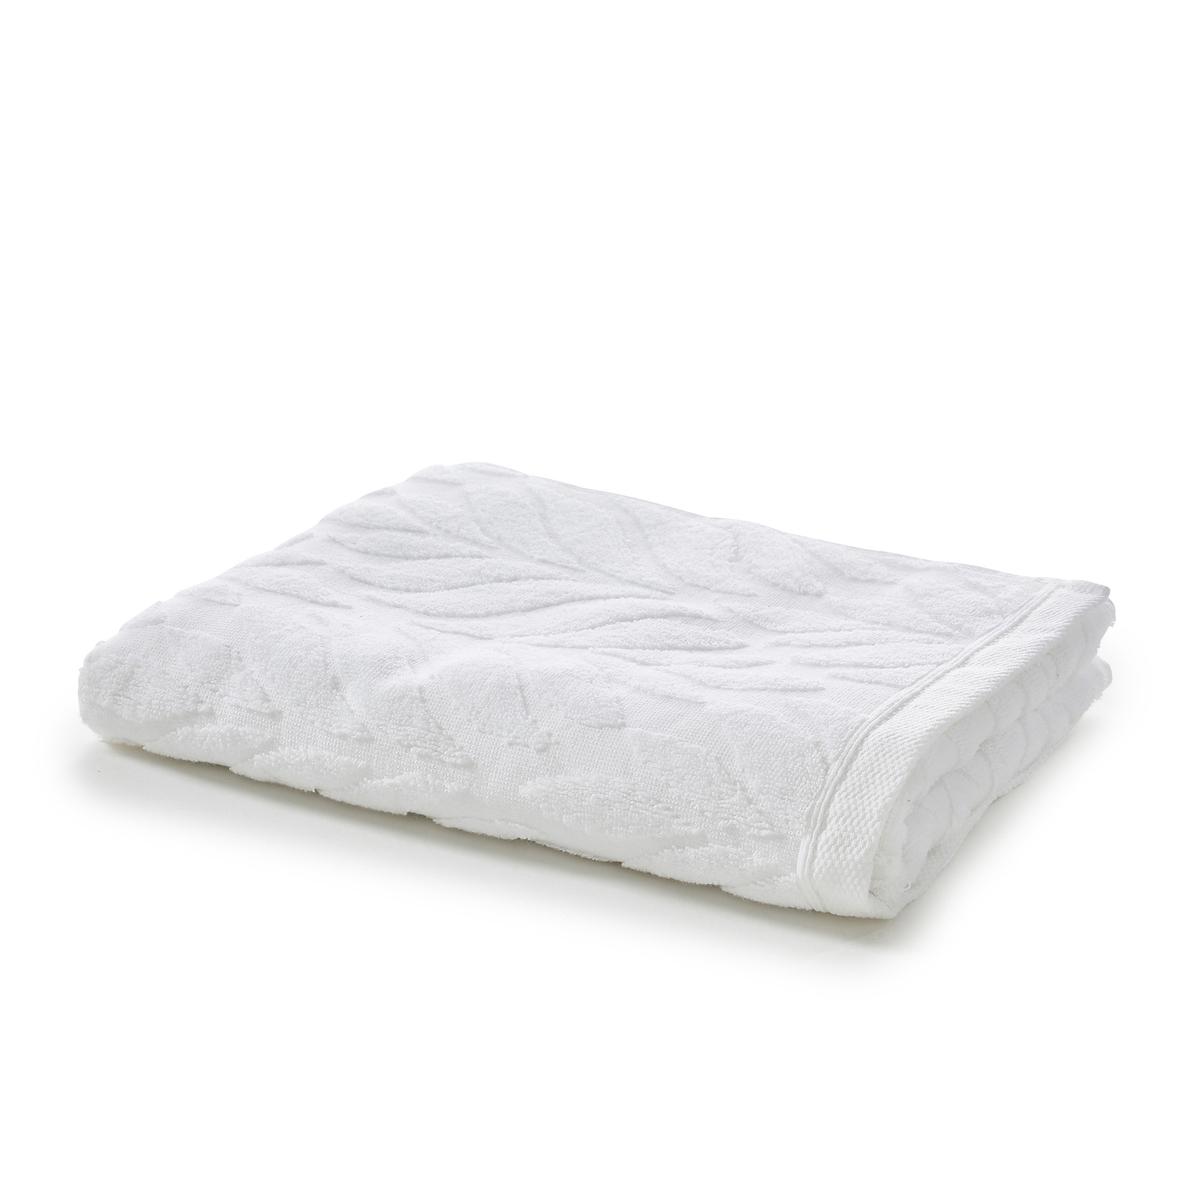 Банное полотенце  46353 от LaRedoute